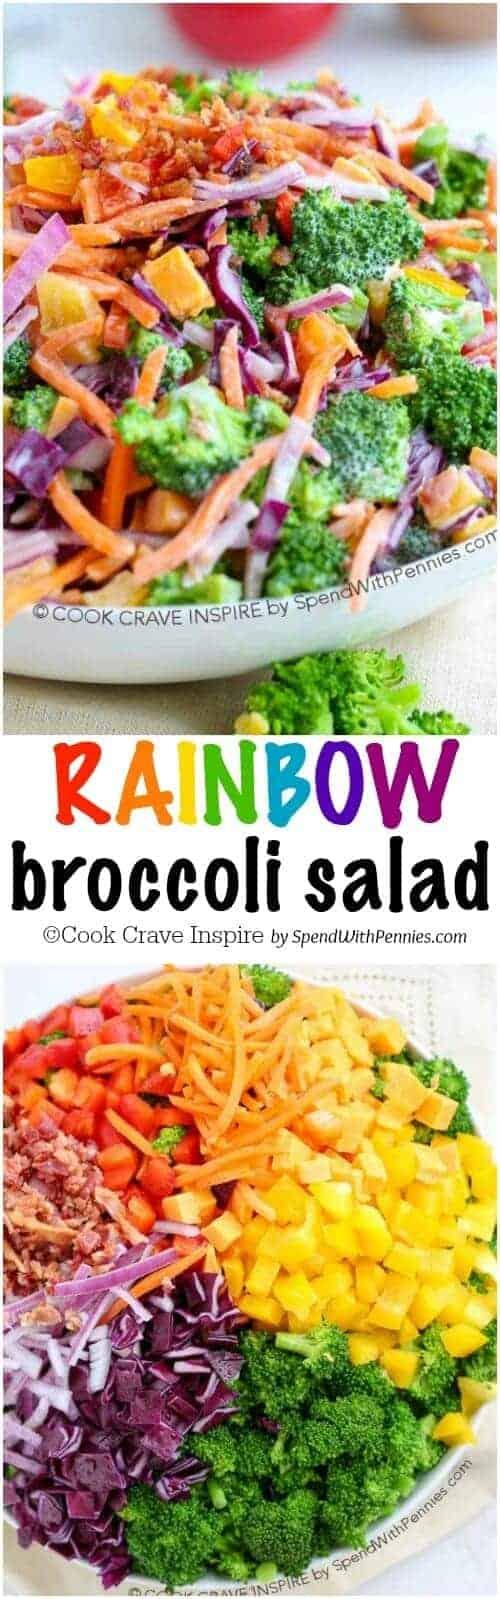 bacon and cheddar bacon broccoli salad with broccoli salad 2 broccoli ...